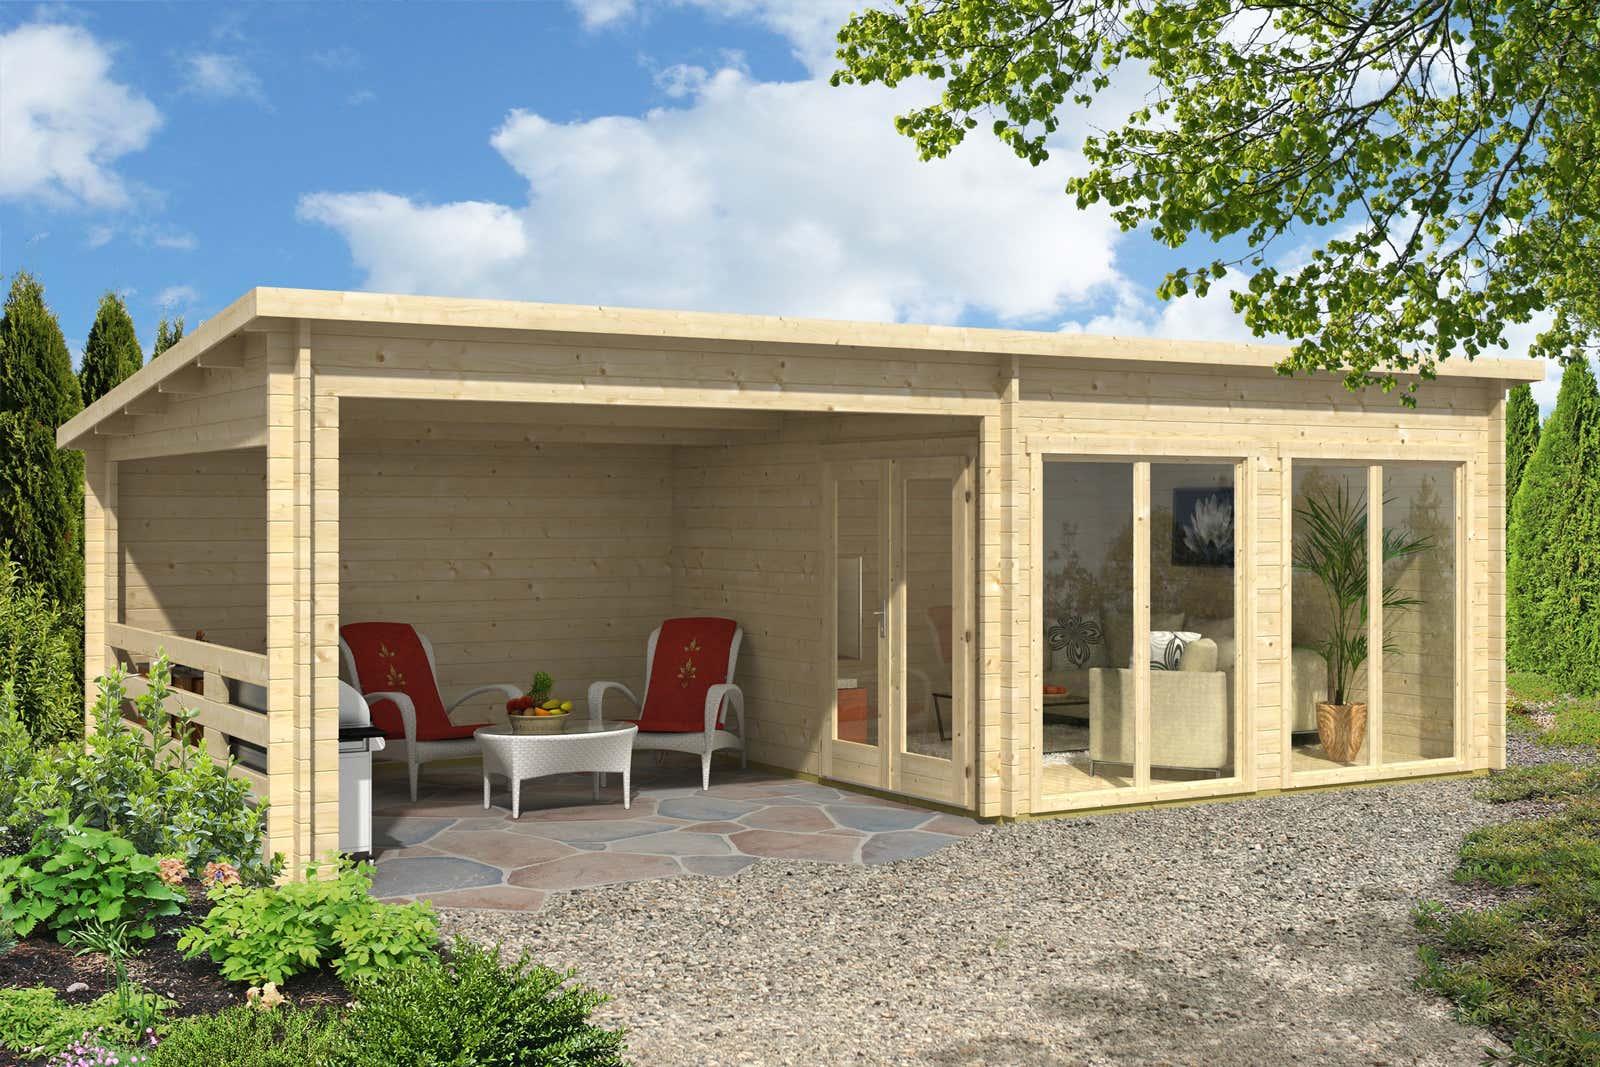 gartenhaus island 44 iso a z gartenhaus gmbh. Black Bedroom Furniture Sets. Home Design Ideas